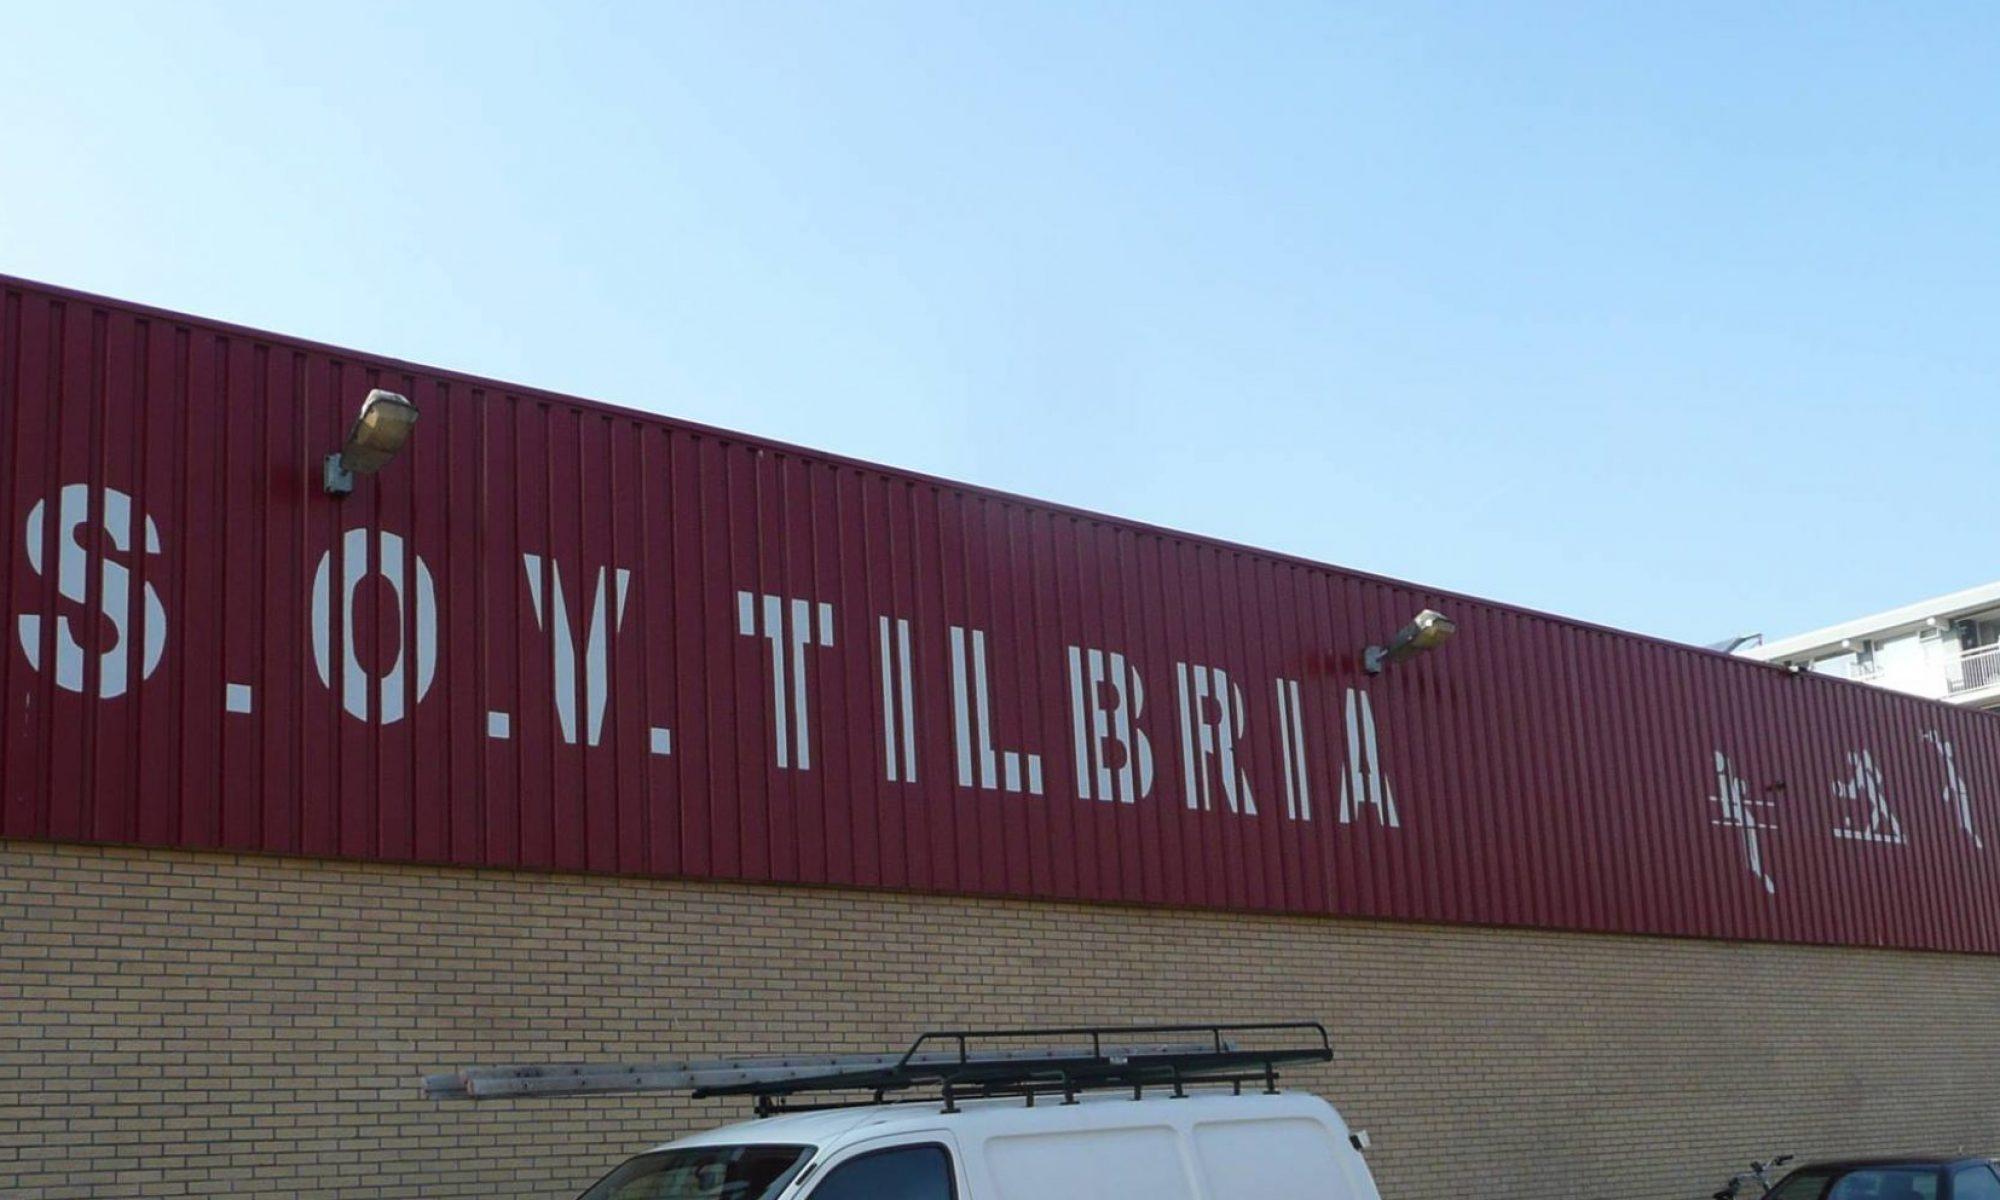 S.O.V. Tilbria